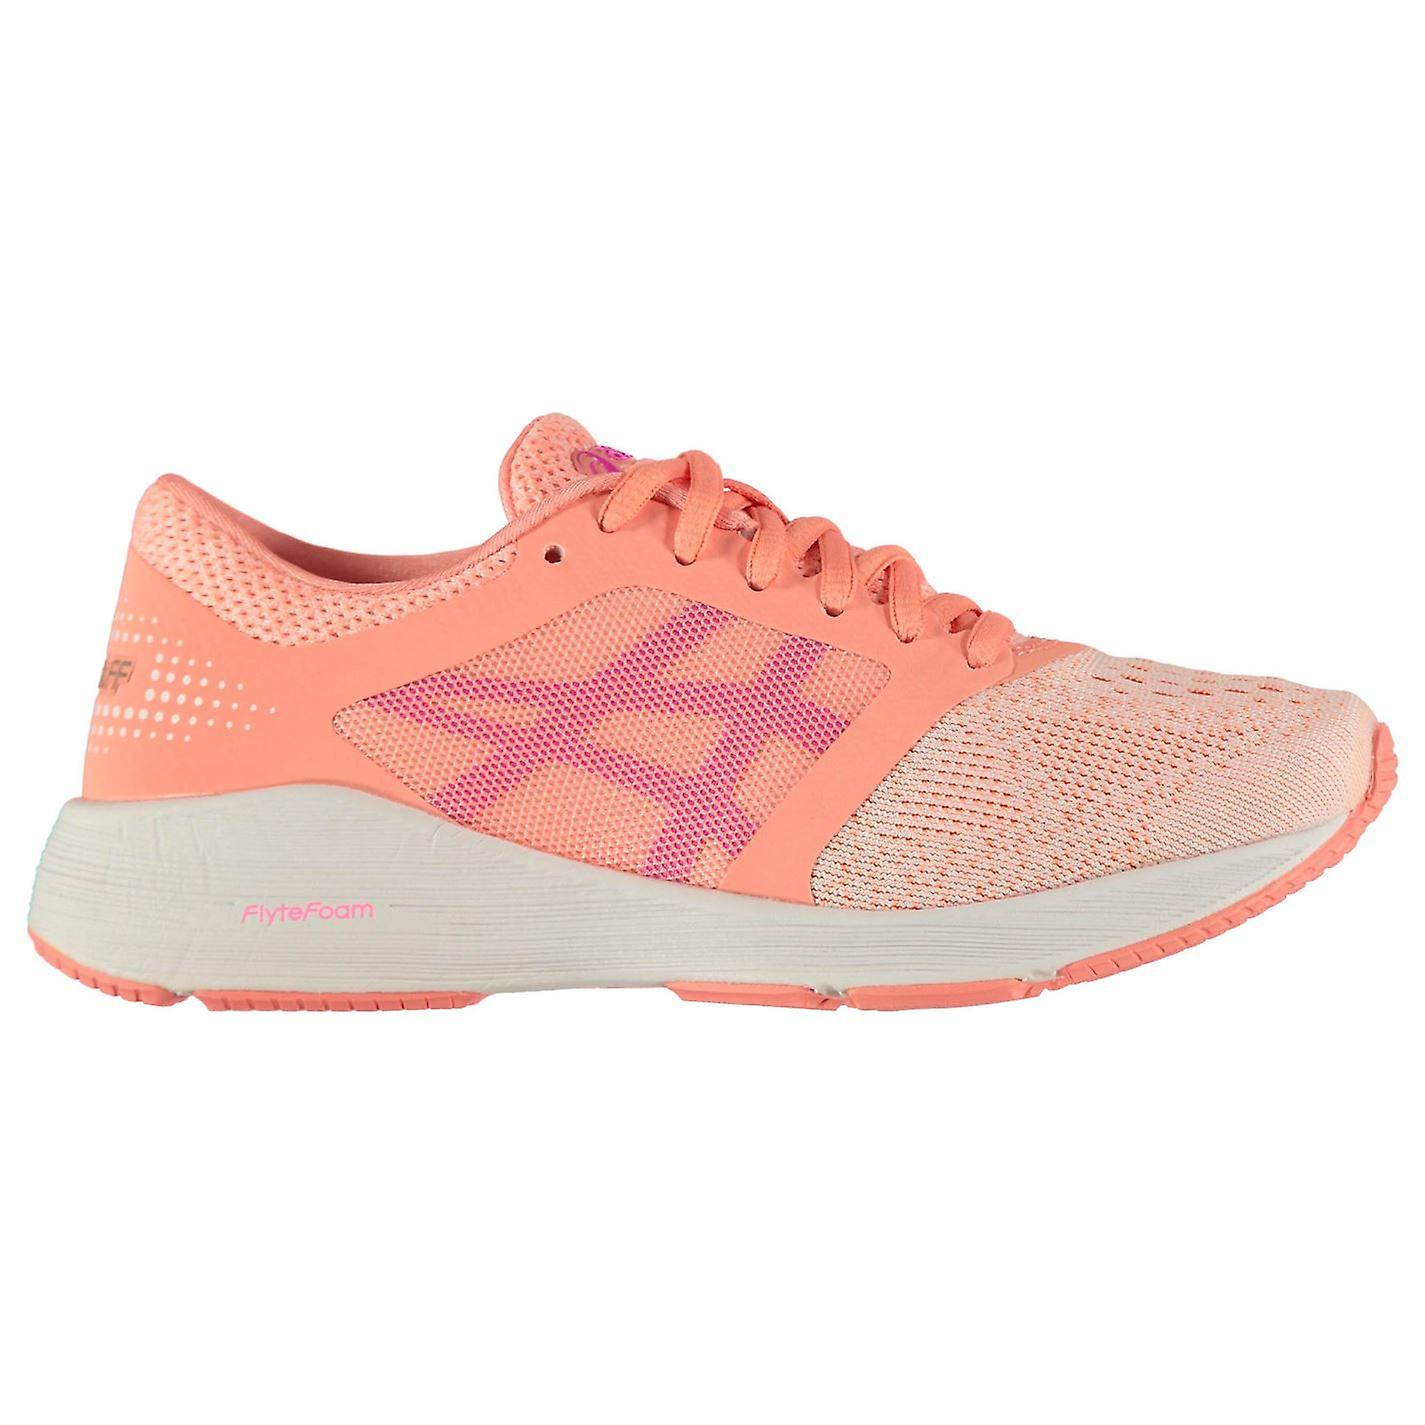 Asics femmes Roadhawk FF Ladies Running chaussures Training Sports Trainers baskets